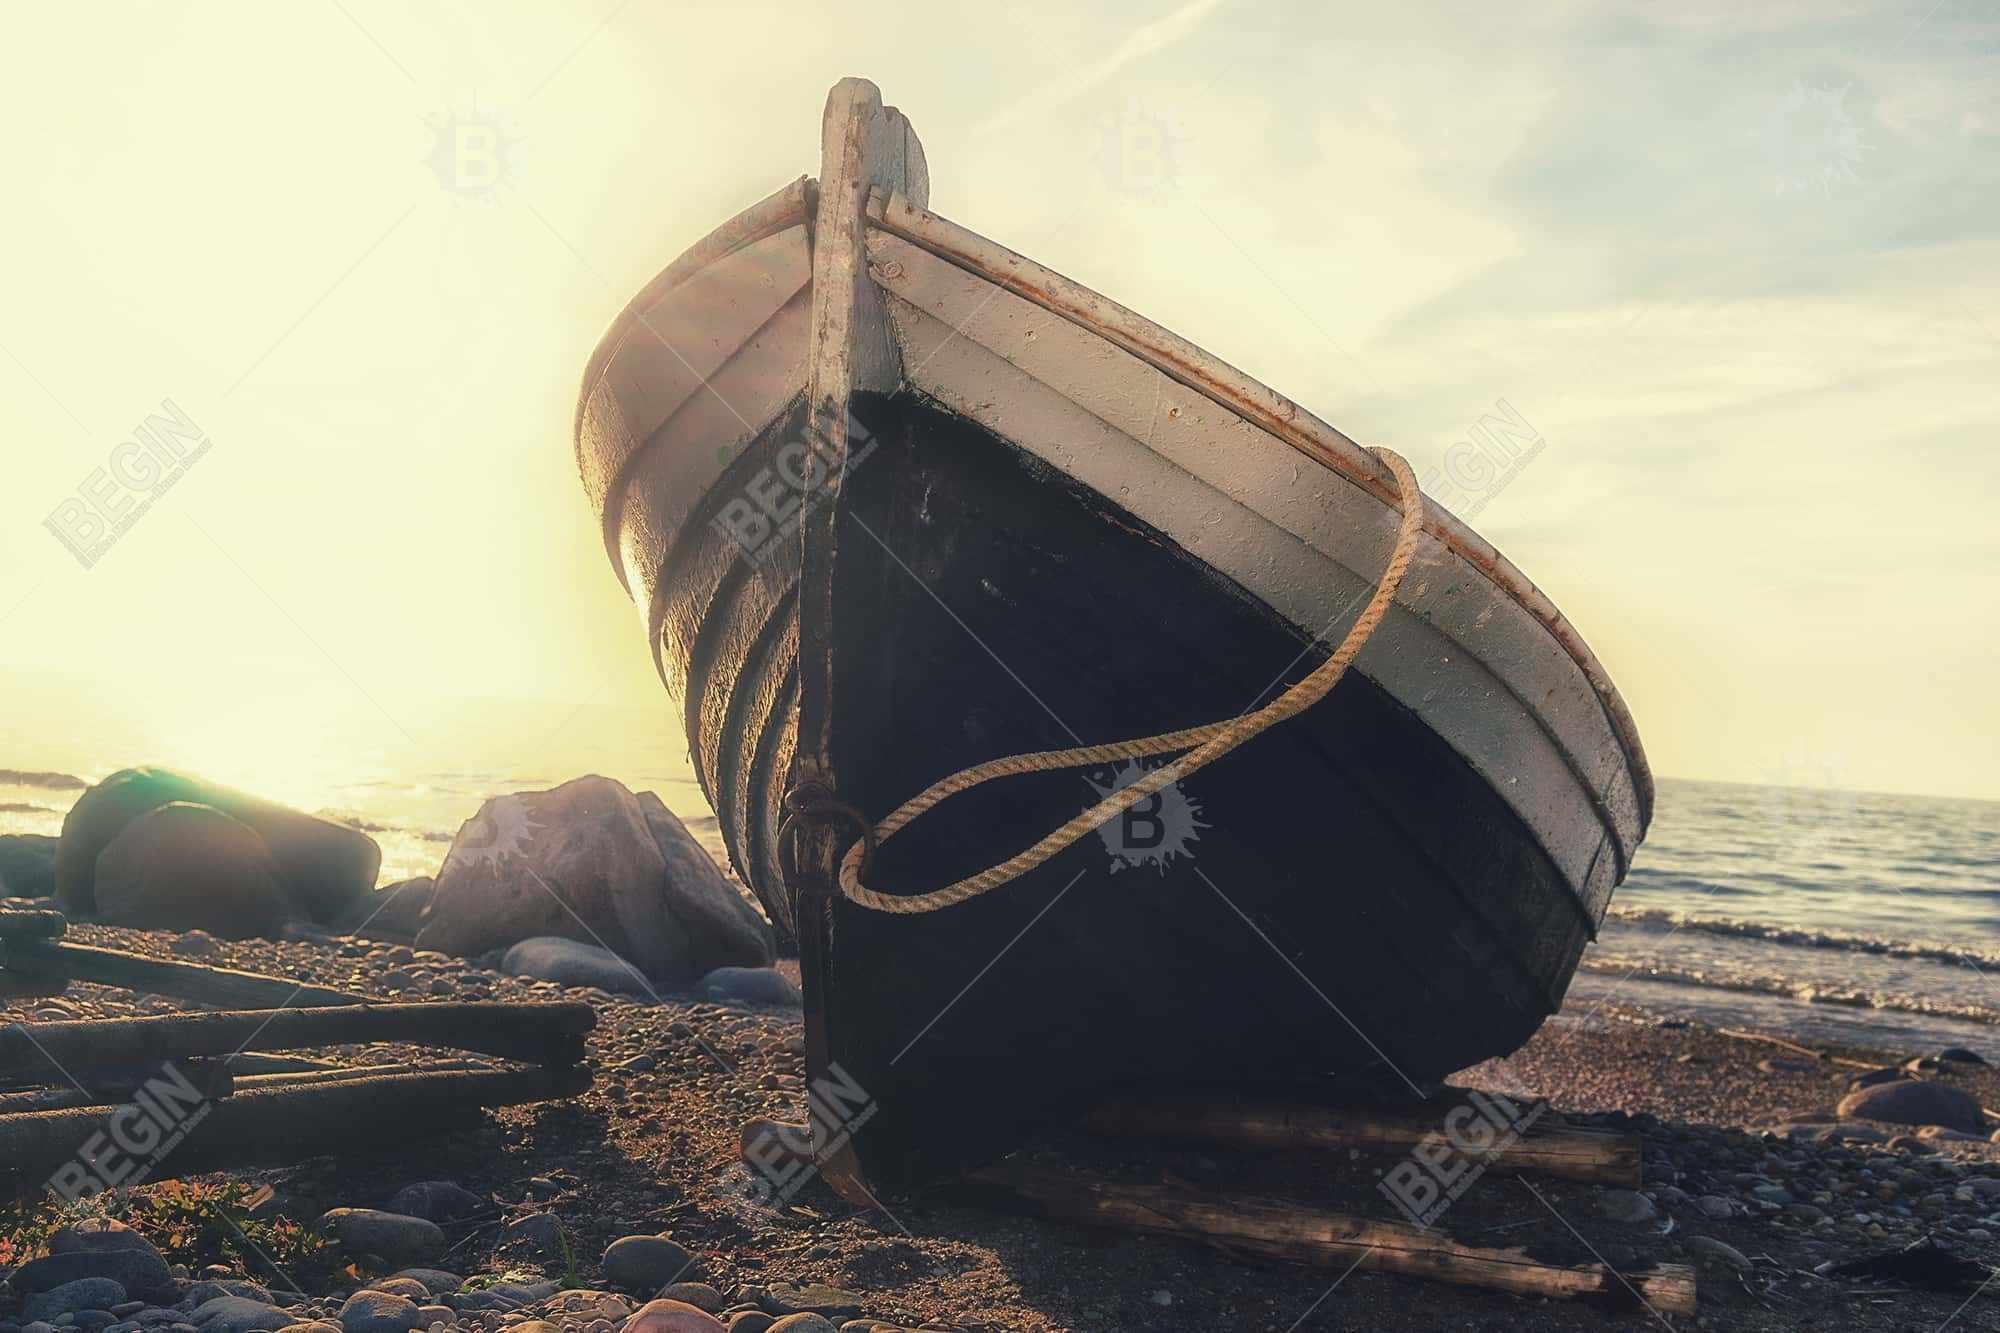 Rowboat at the water's edge